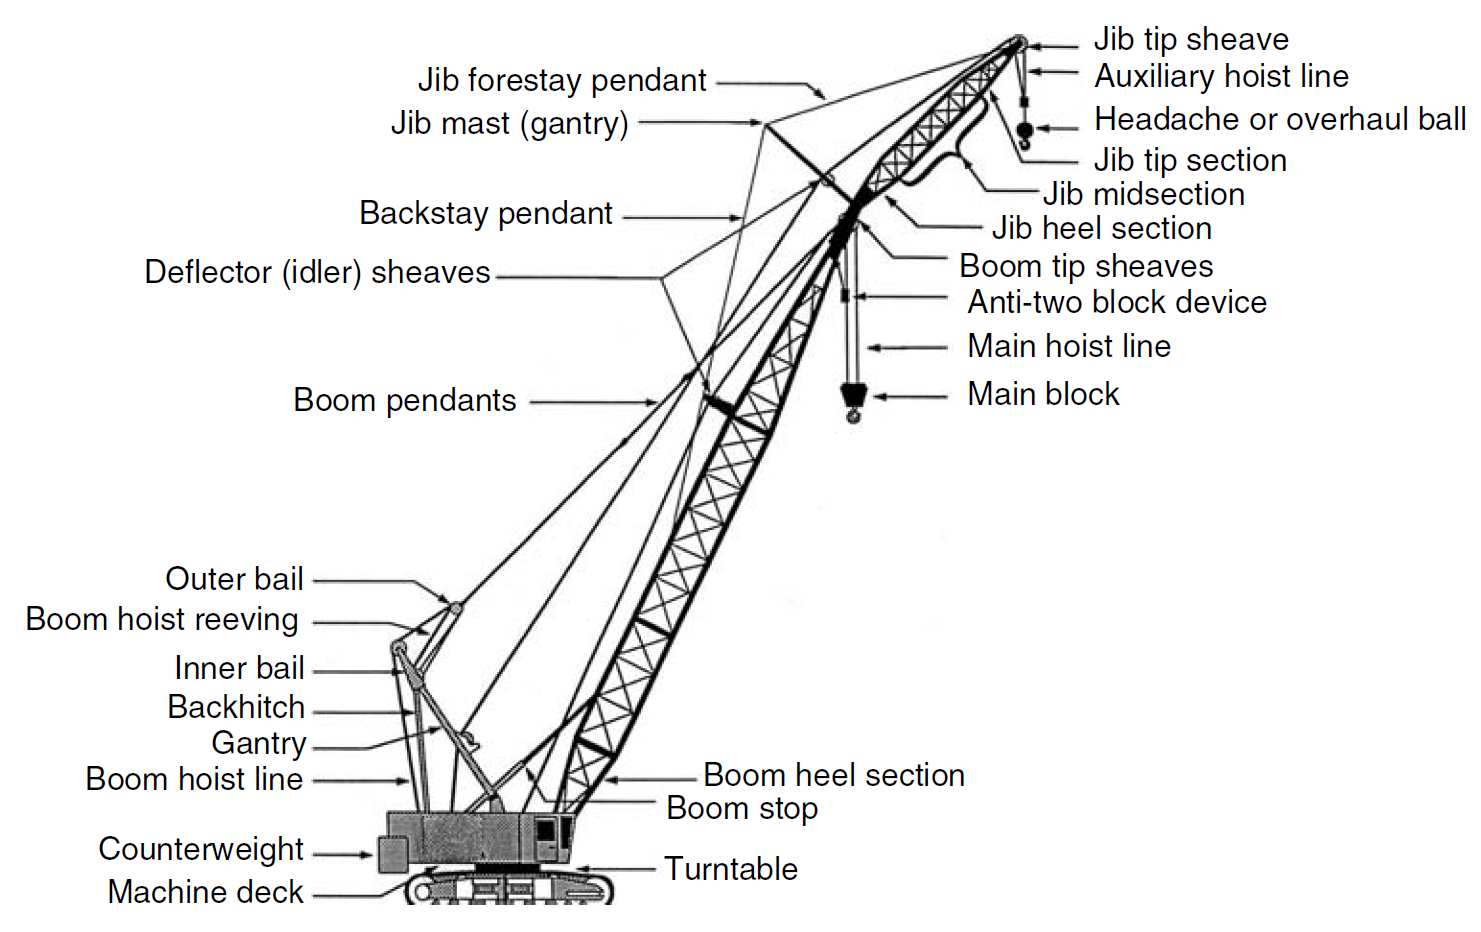 hight resolution of lattice boom crawler cranes engineersdaily free engineering database lattice boom crawler crane diagram lattice boom crawler crane diagram